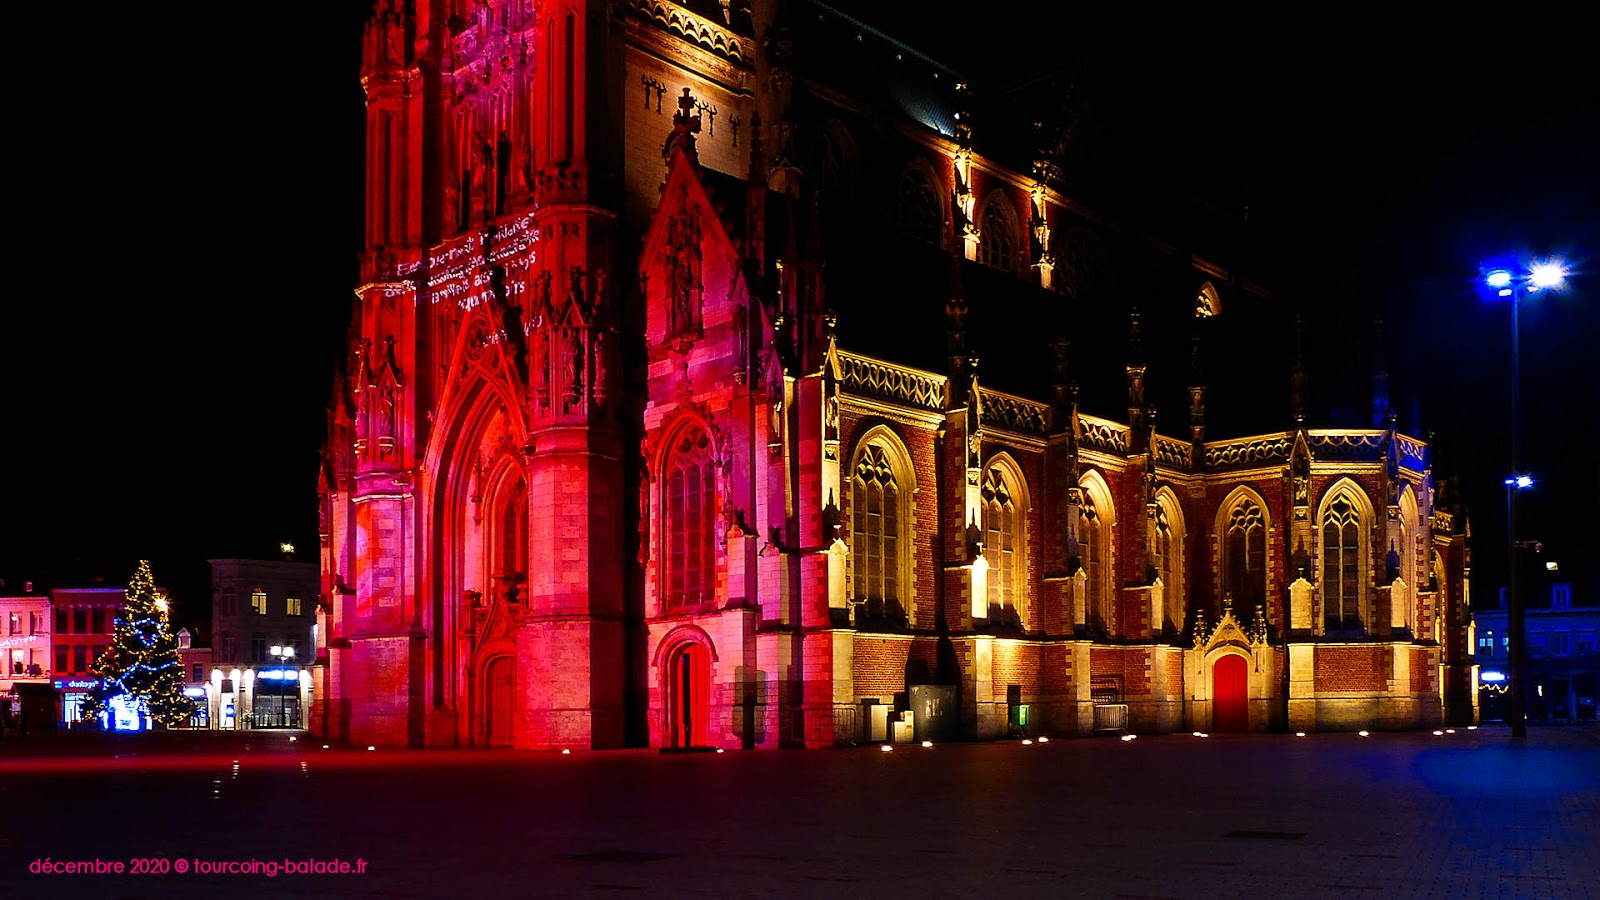 Tourcoing Nuit 2020 - Église Saint-Christophe